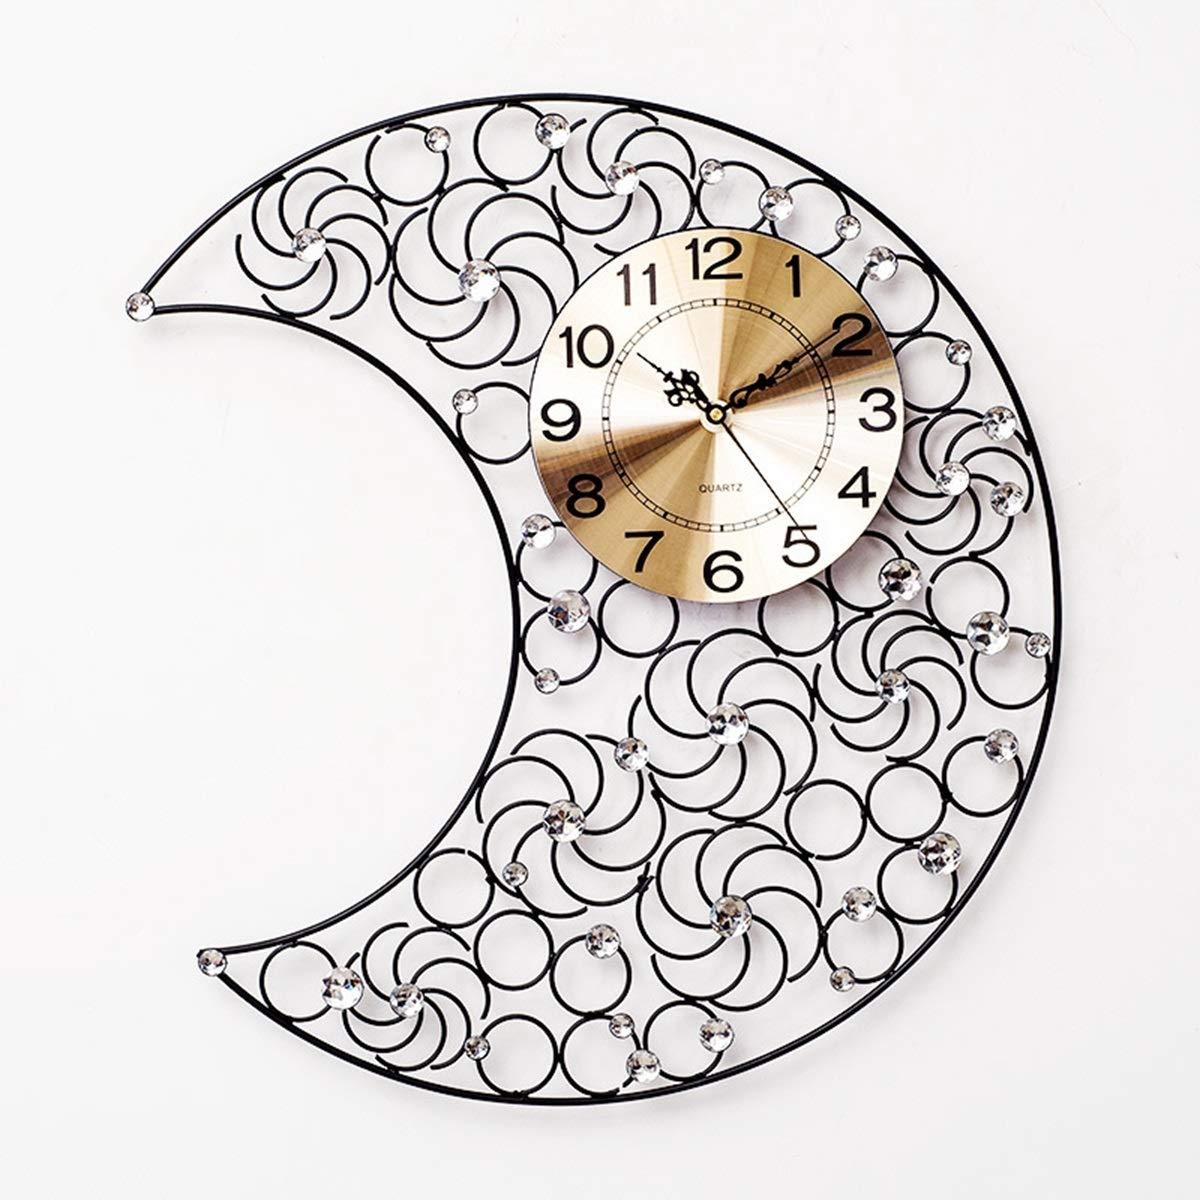 Cetengkeji 現代大きい月の水晶ダイヤモンドの居間のための錬鉄の柱時計の水晶無声壁時計 (Color : Black)  Black B07R4JHKKL